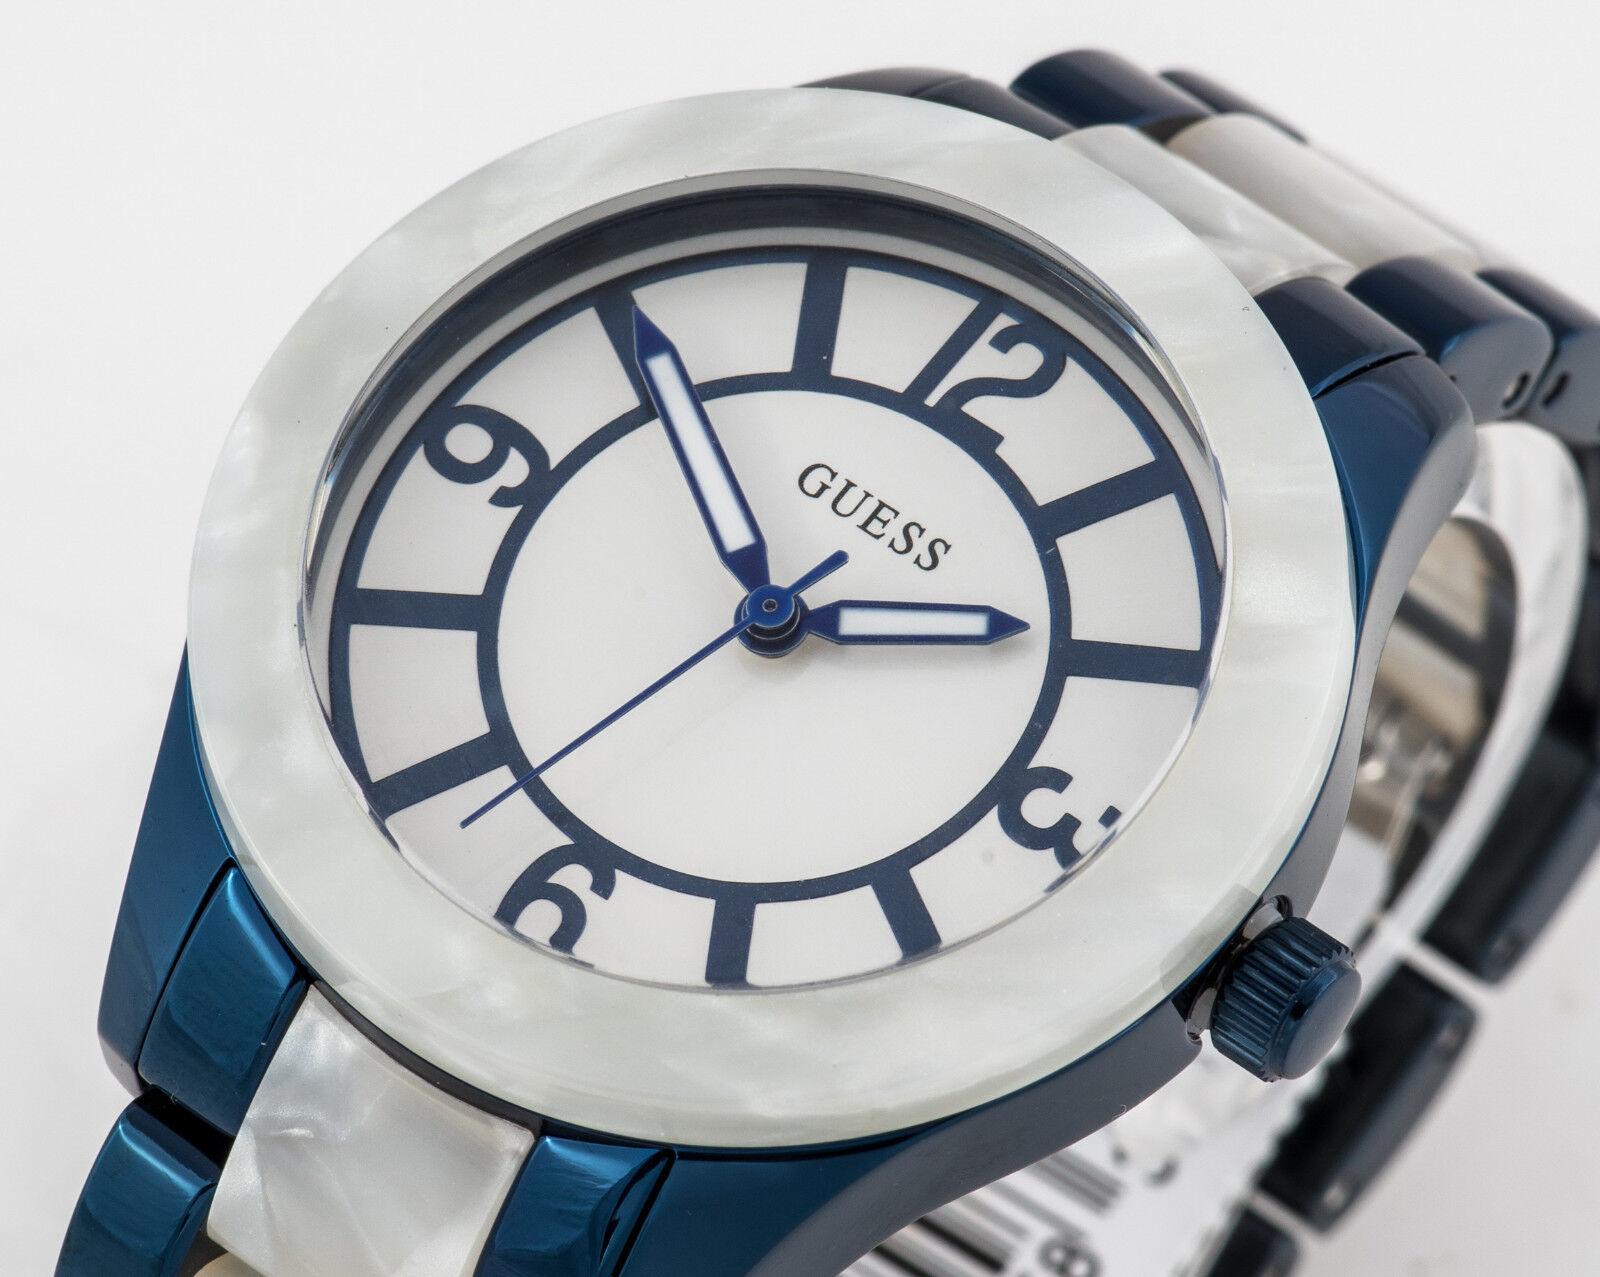 GUESS Damen Uhr Edelstahl blau weiß Keramik perlmutt NEU W0074L3 G6